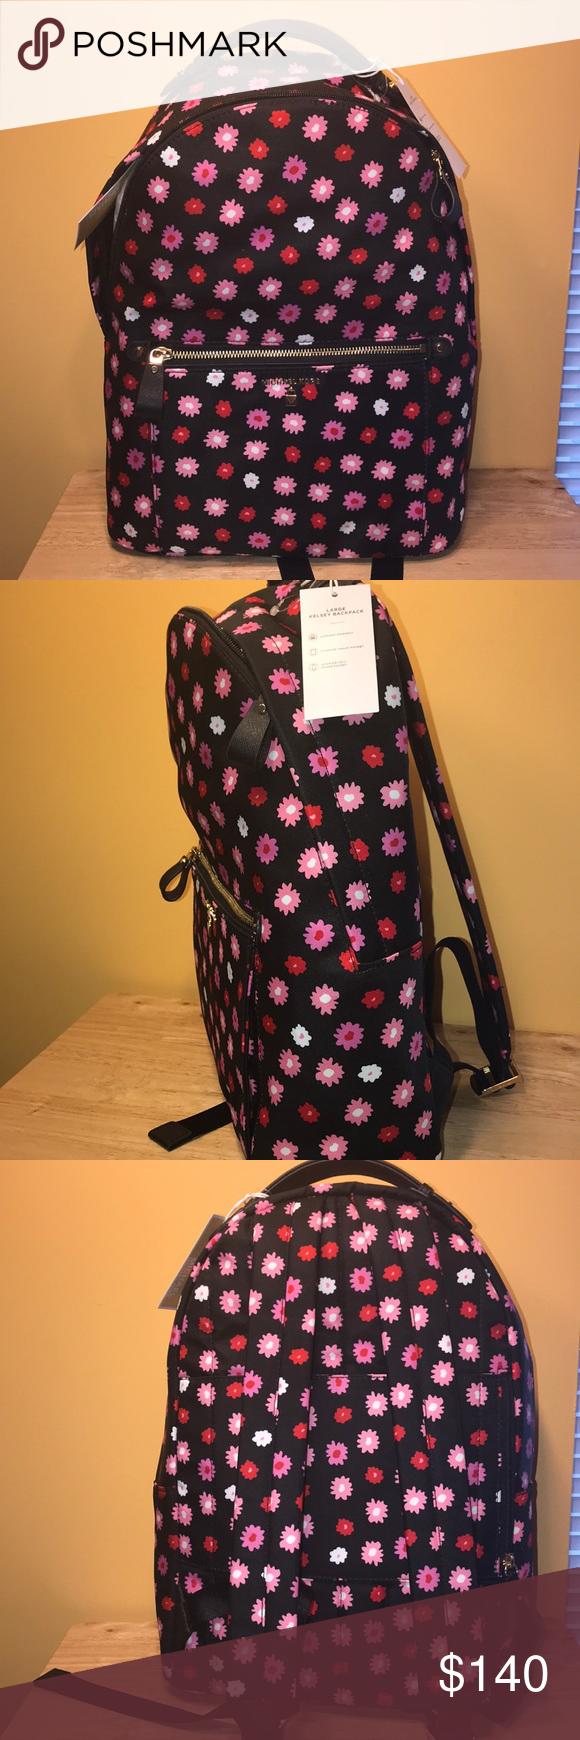 06ed5b17546a Kelsey Large Floral Nylon Backpack- Fenix Toulouse Handball